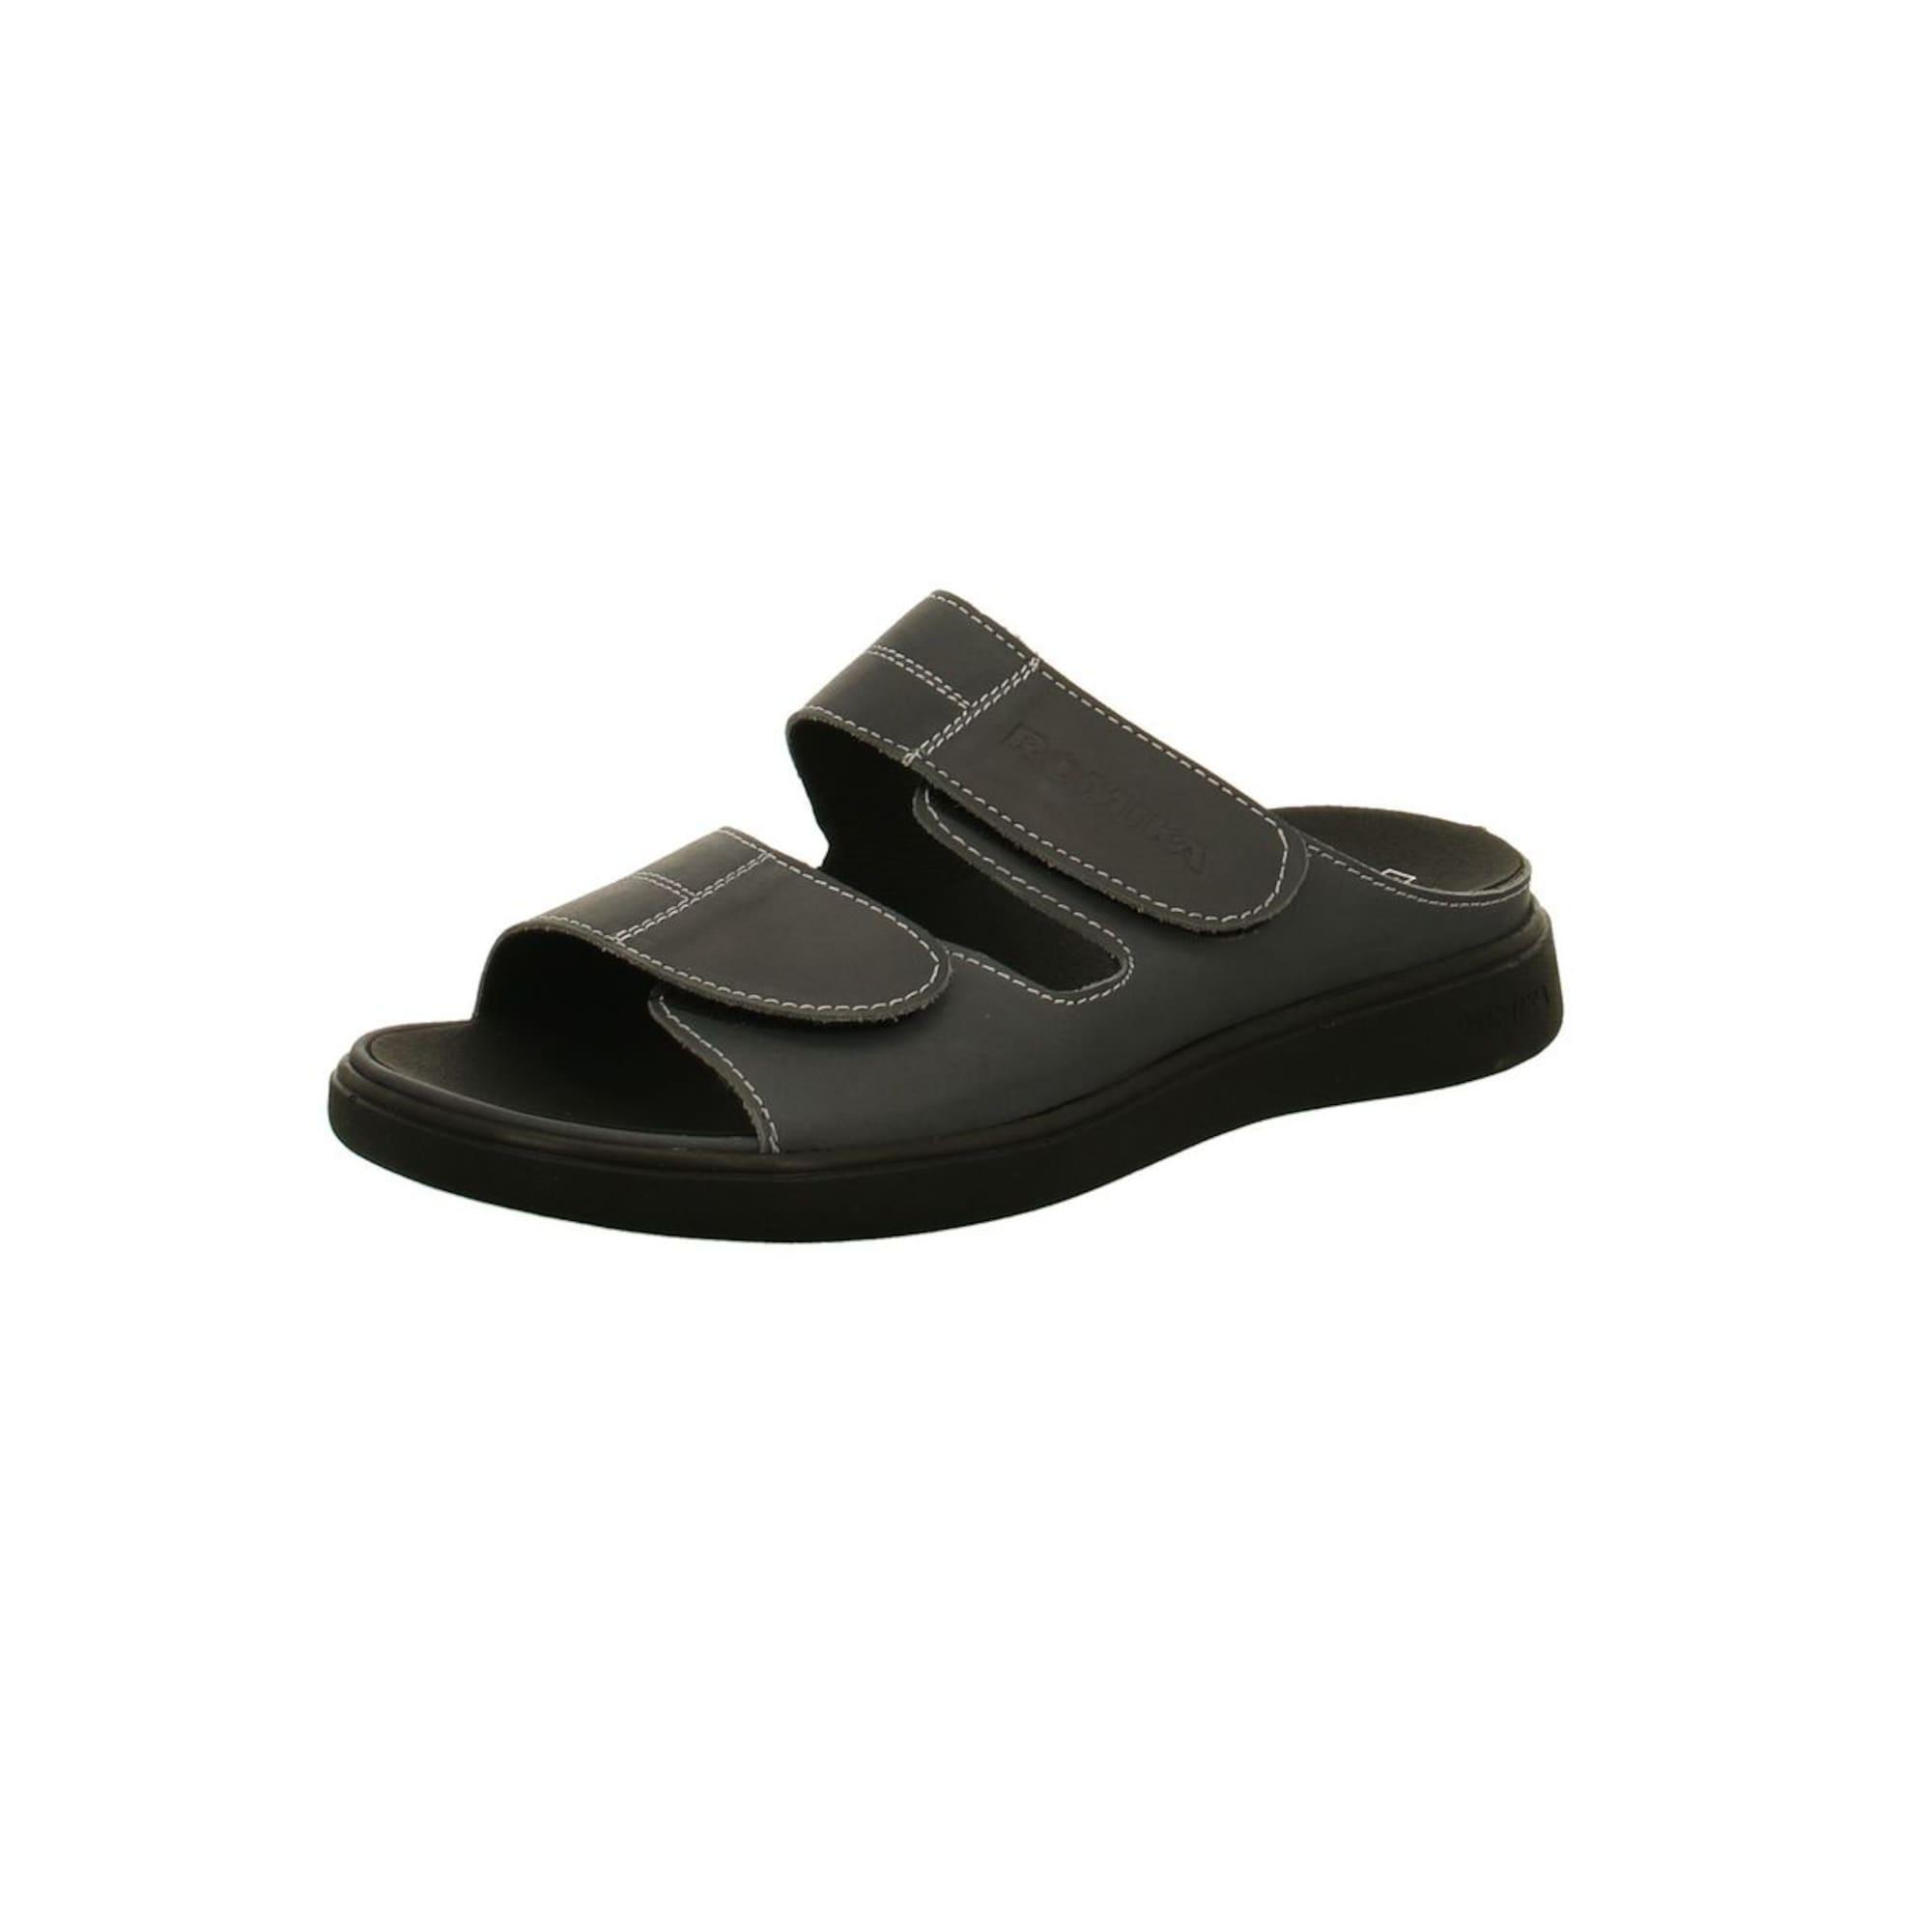 Pantoletten | Schuhe > Clogs & Pantoletten | Dunkelblau | ROMIKA